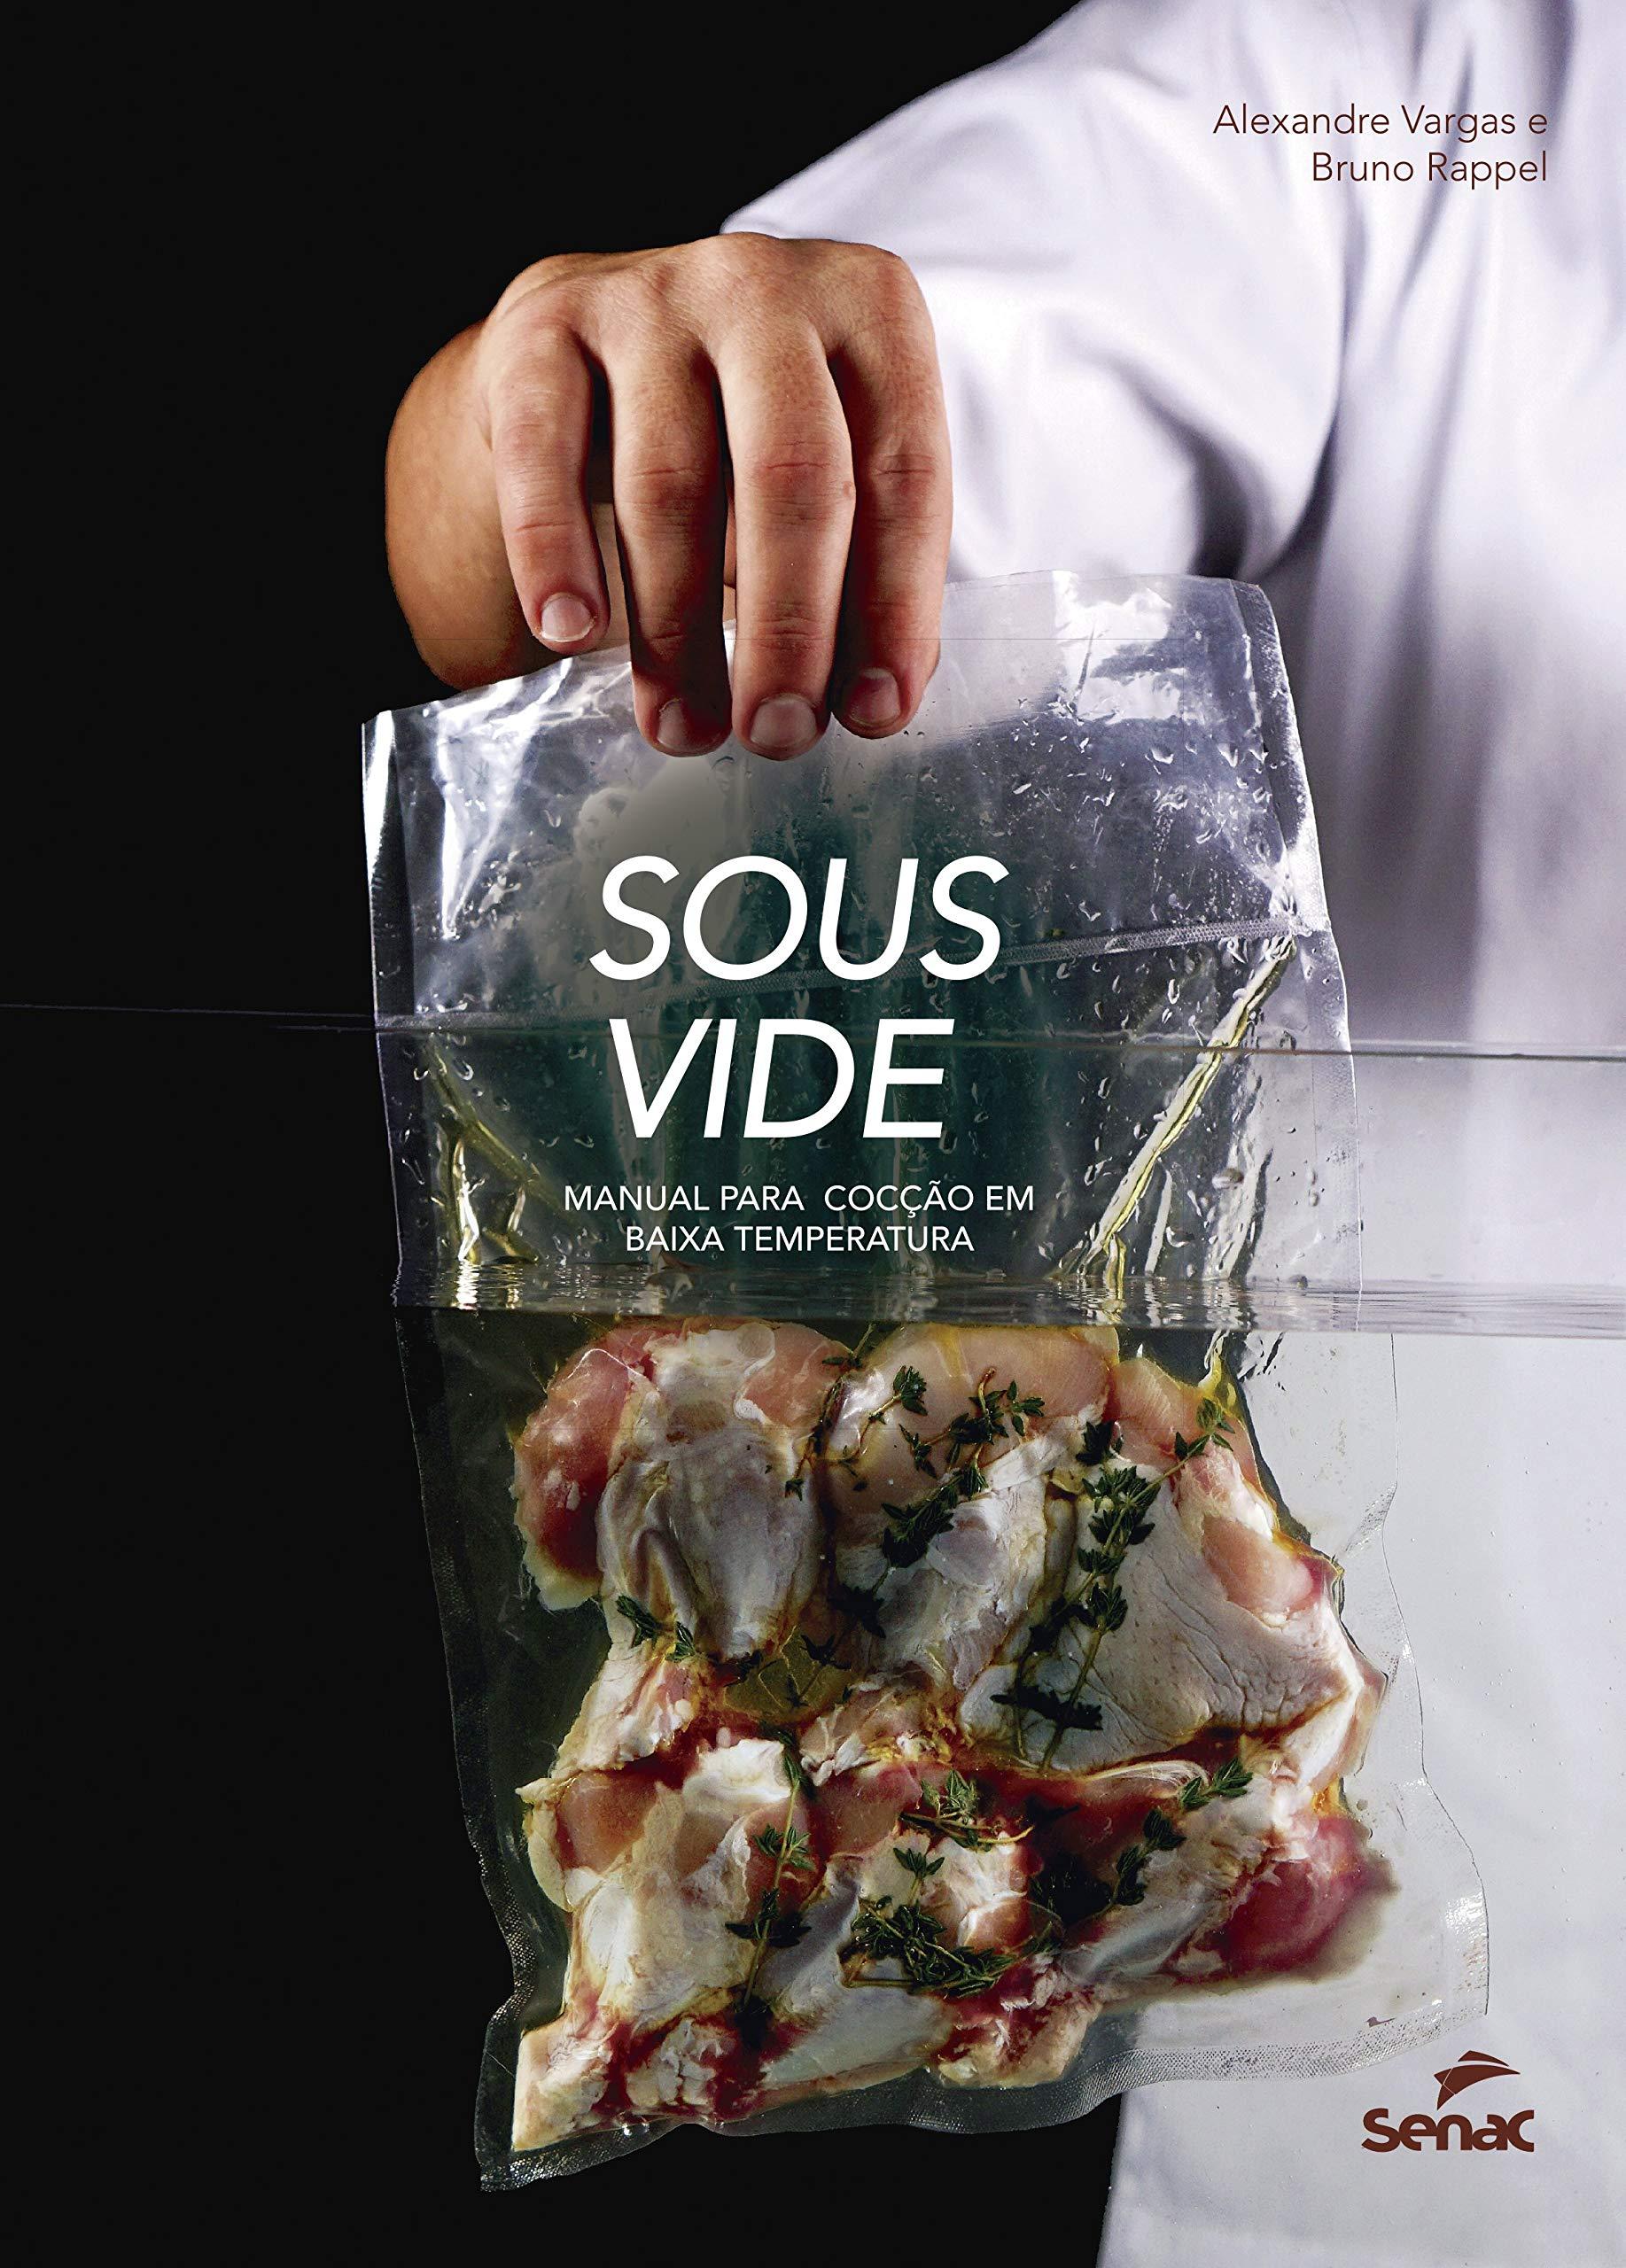 Sous vide: Manual para cocção em baixa temperatura: Amazon.es: Alexandre Vargas: Libros